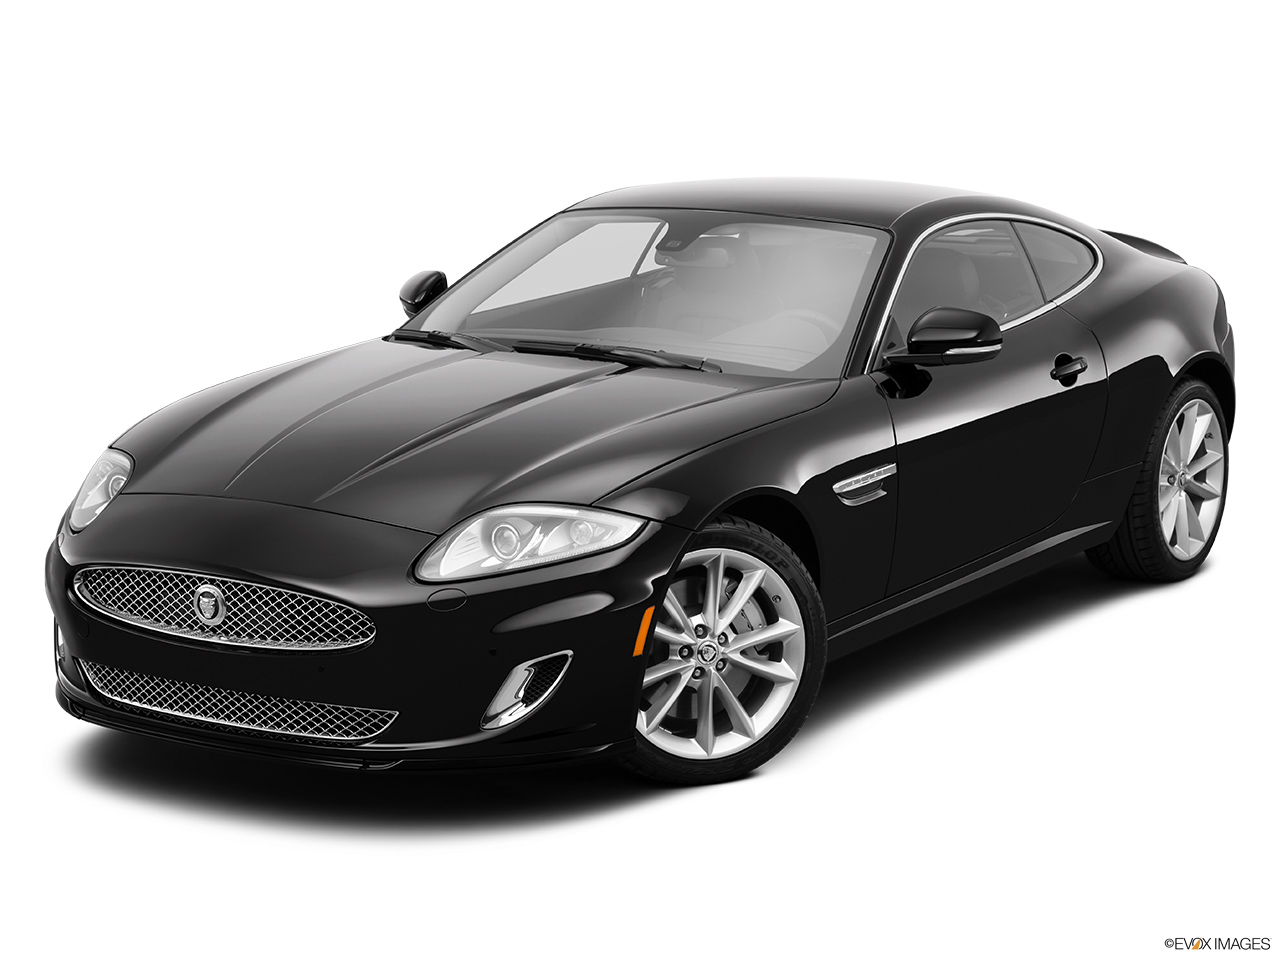 2014 jaguar xk coupe touring. Black Bedroom Furniture Sets. Home Design Ideas